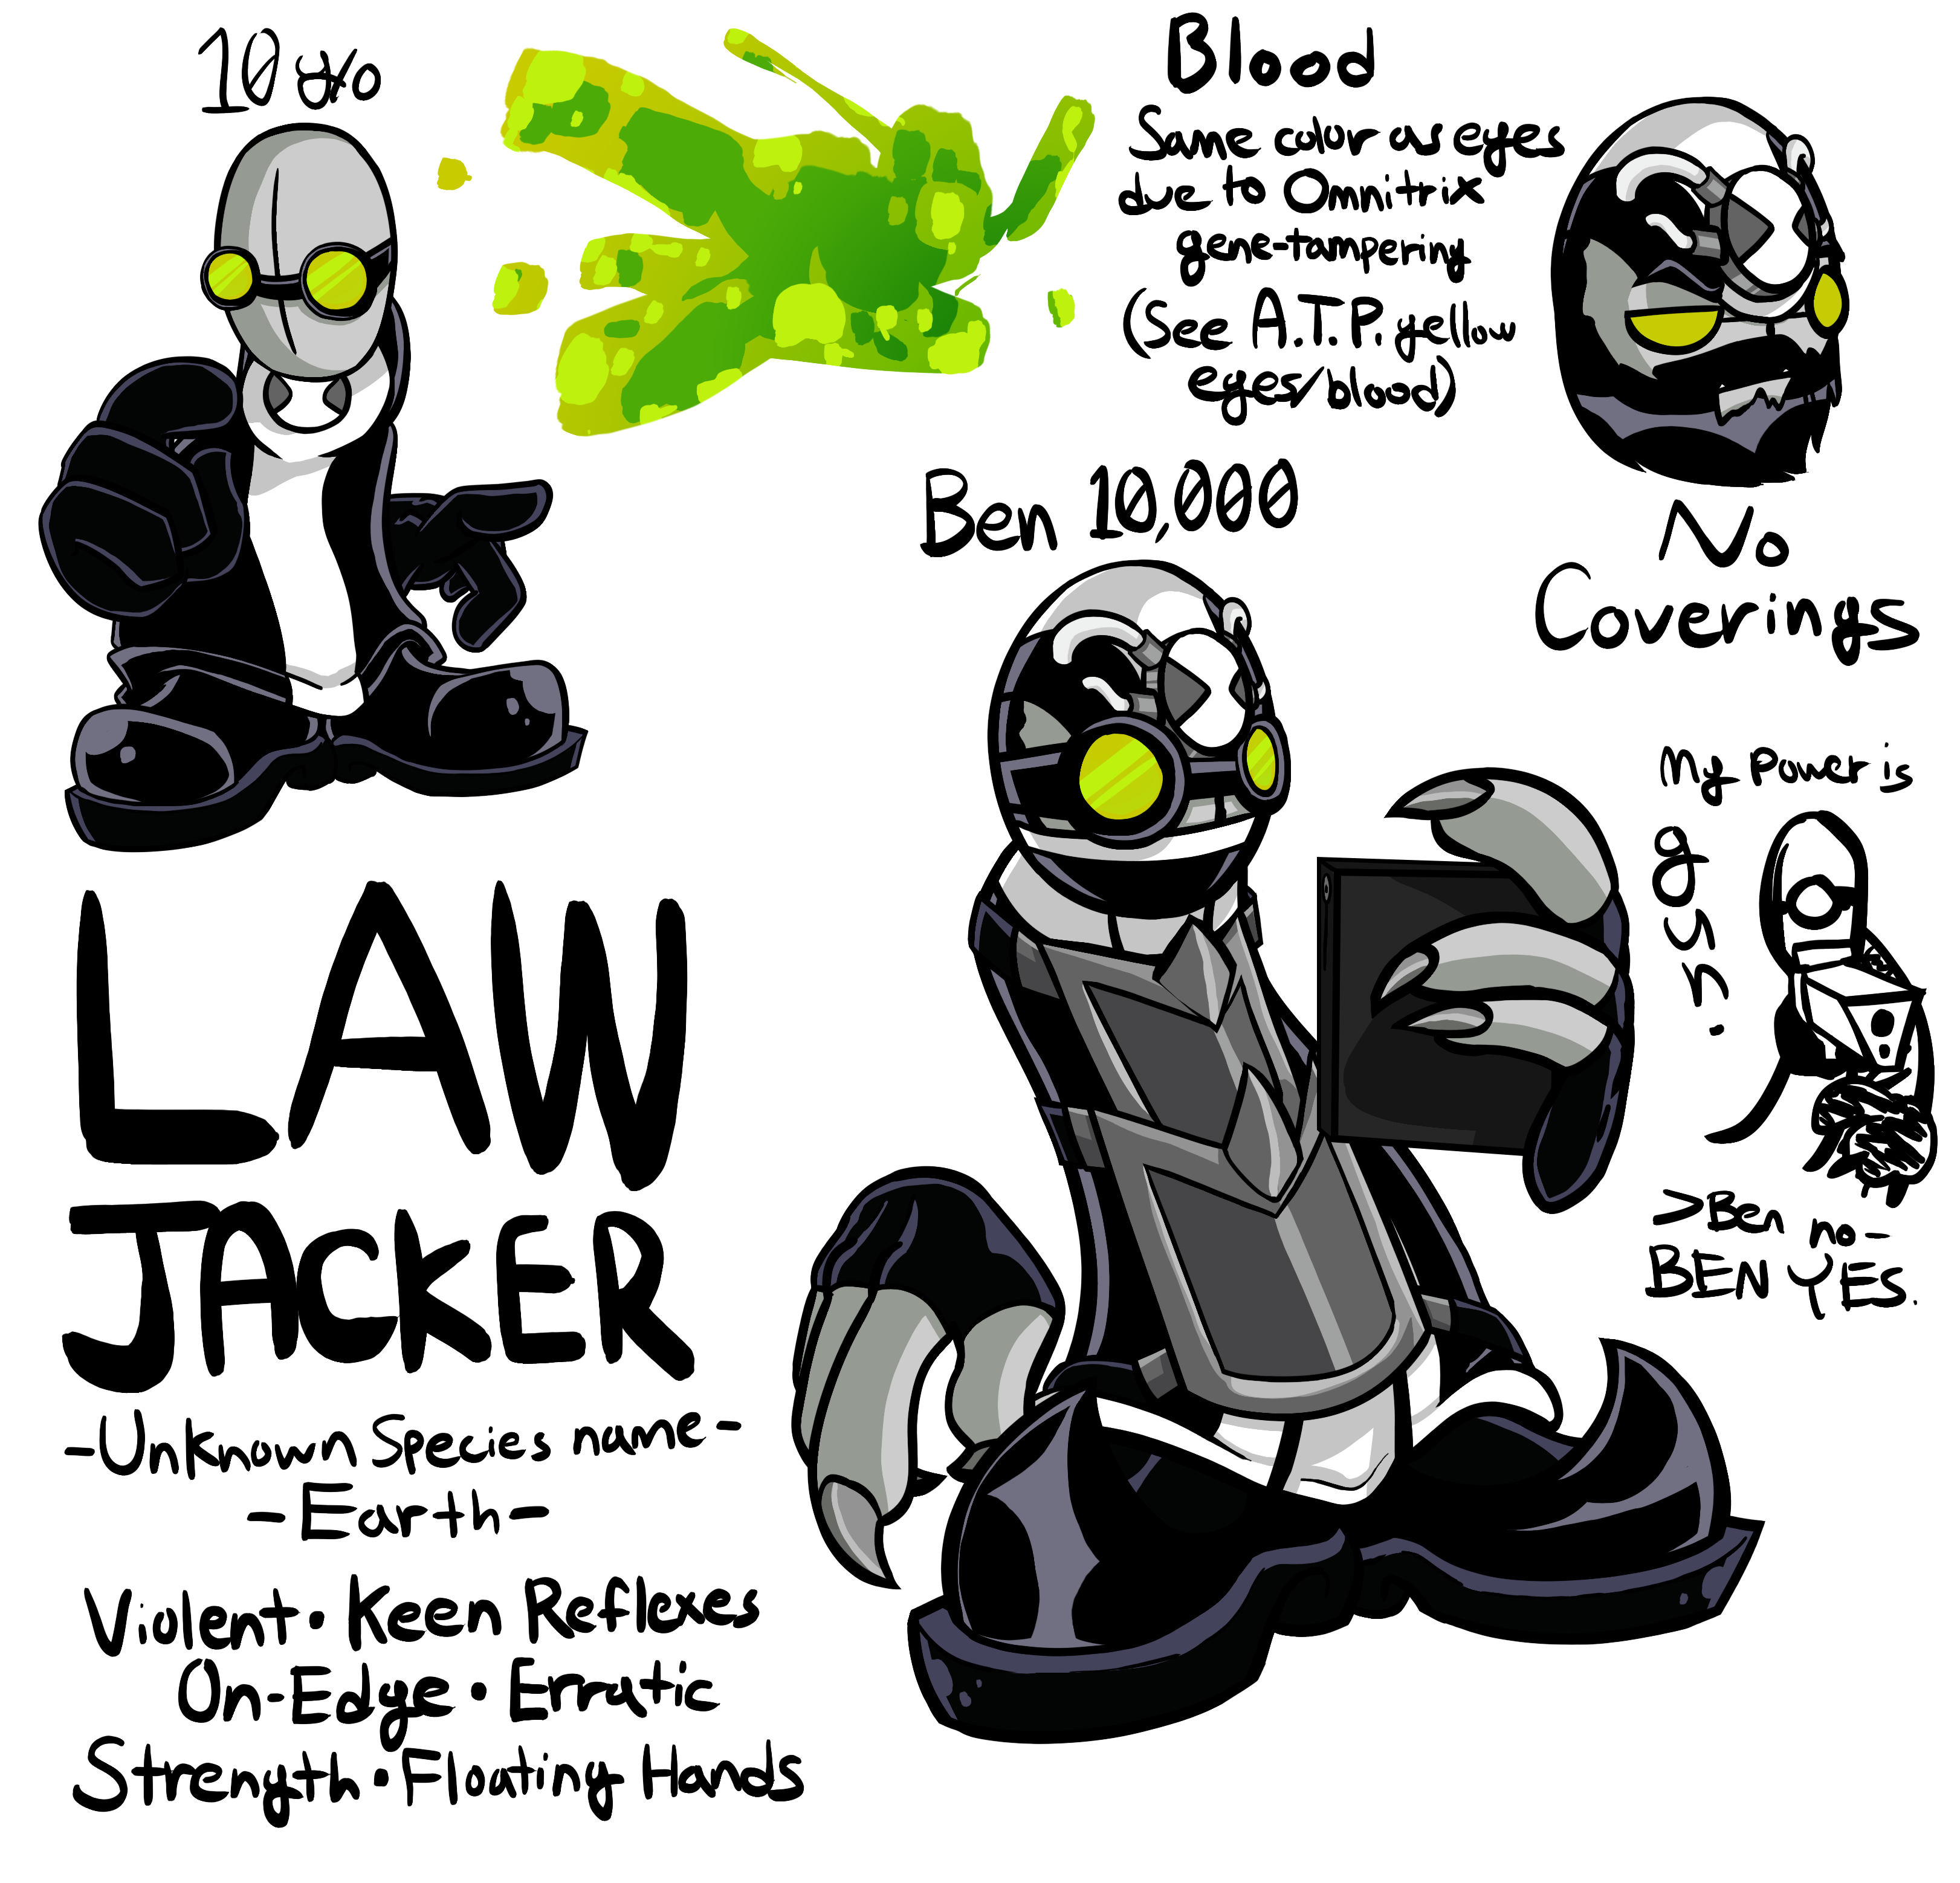 LAWJACKER {Ben 10/Madness Combat}